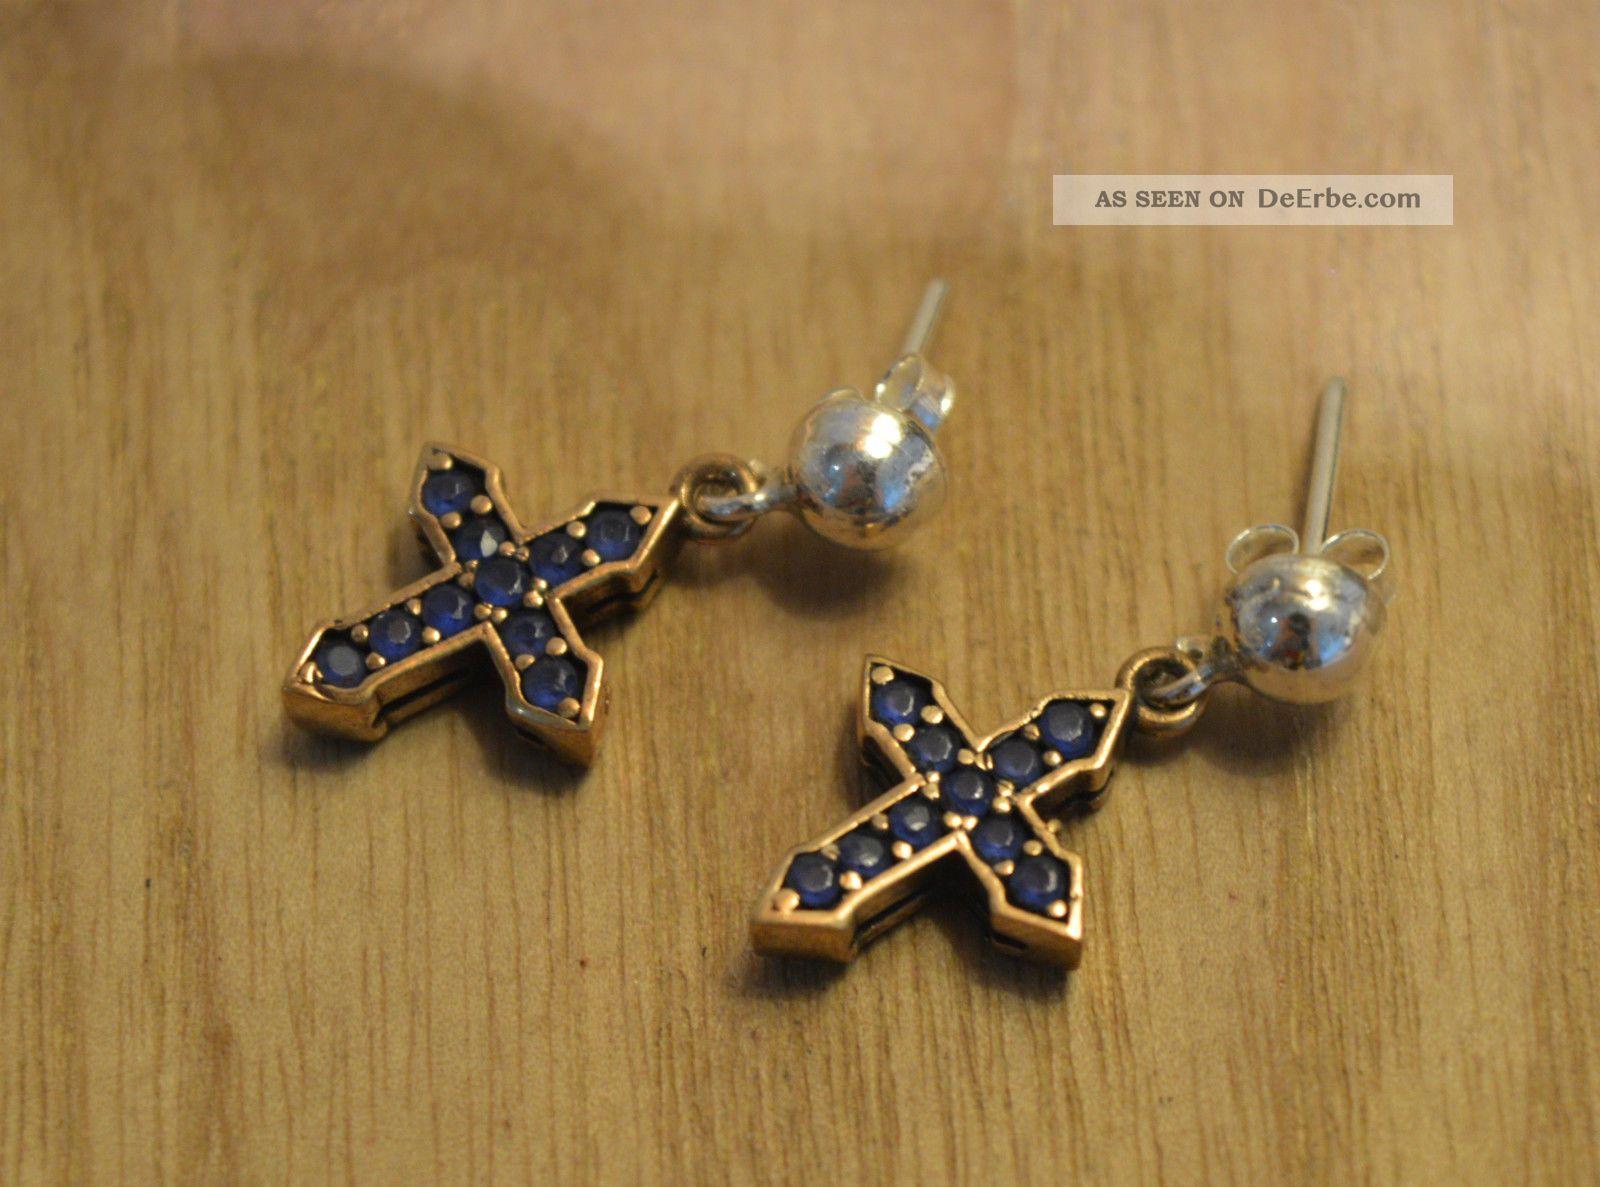 Antik Ohrringe Ohrhänger Echt Silber Handarbeit 925 Mit Gold Earrings. Schmuck nach Epochen Bild